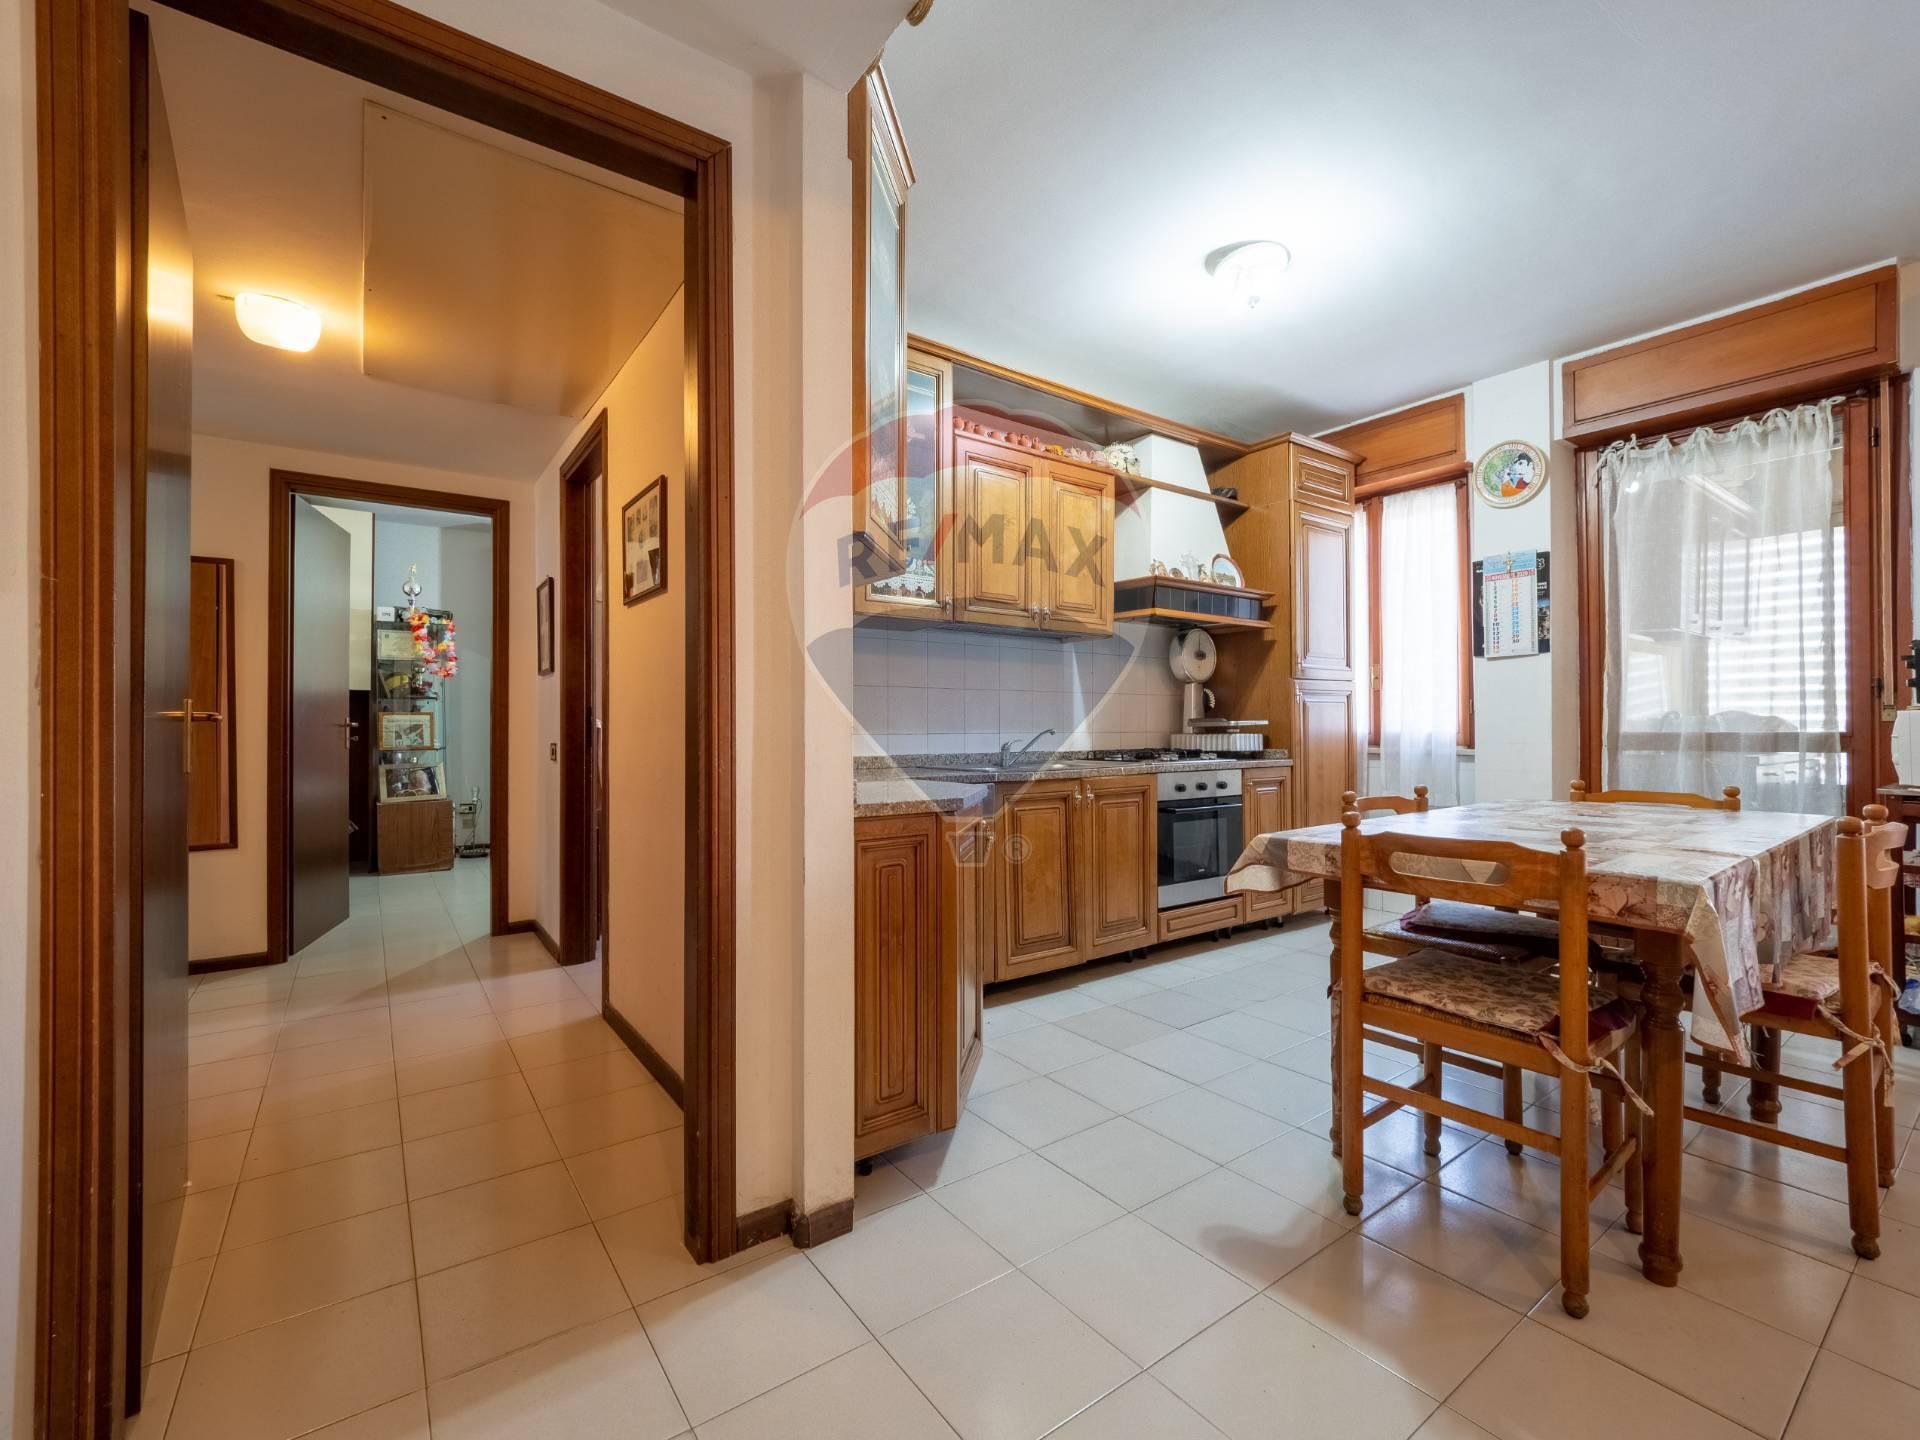 Appartamento, 91 Mq, Vendita - Quartu Sant'elena (CA)